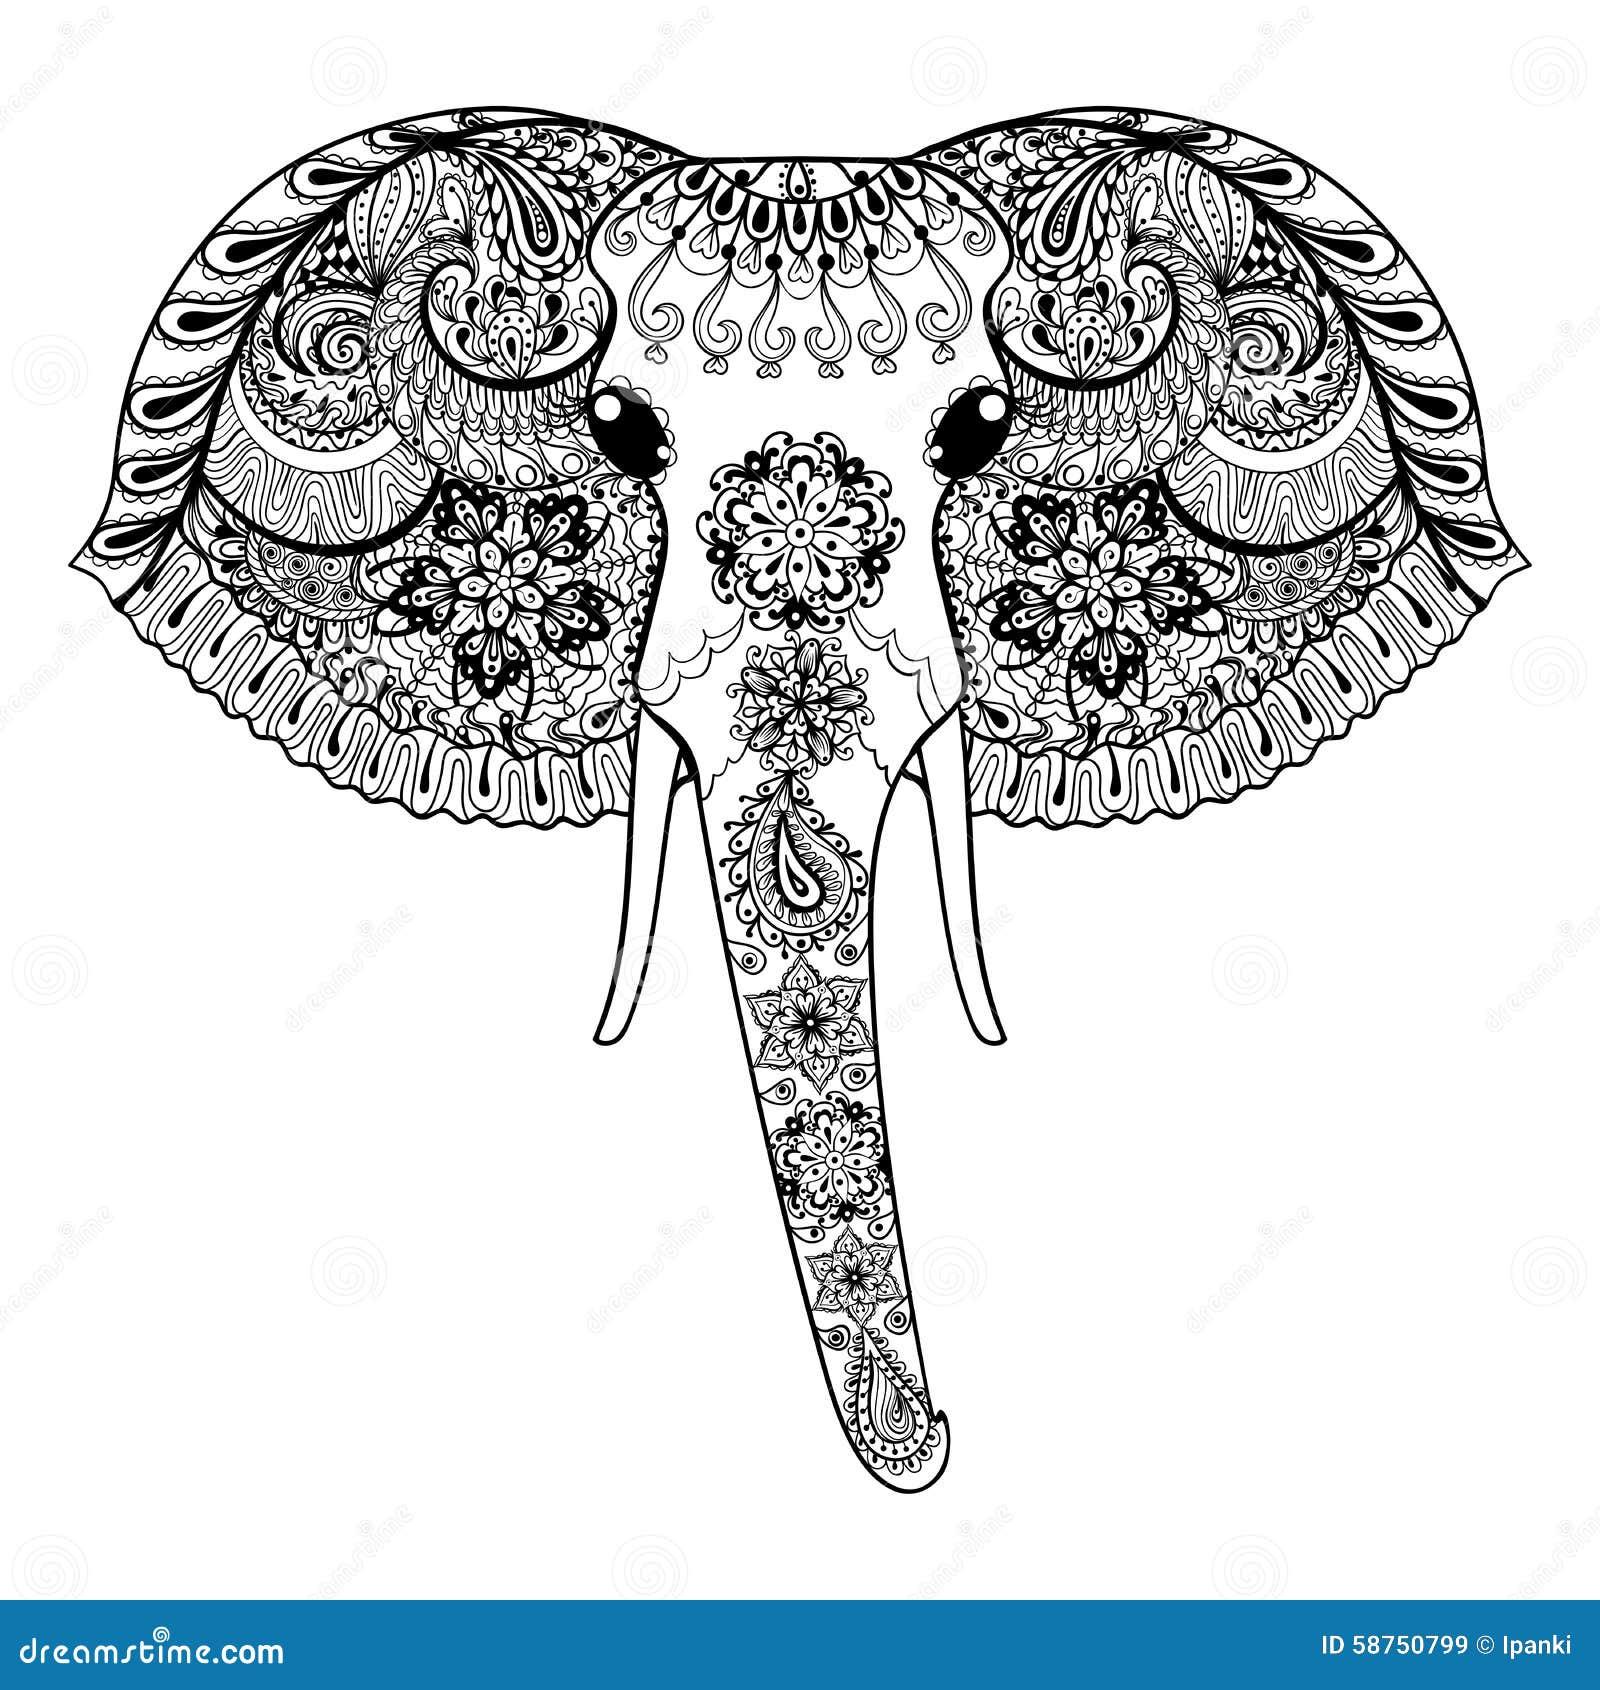 Zentangle stylized indian elephant hand drawn paisley vector il zentangle stylized indian elephant hand drawn paisley vector il gumiabroncs Images